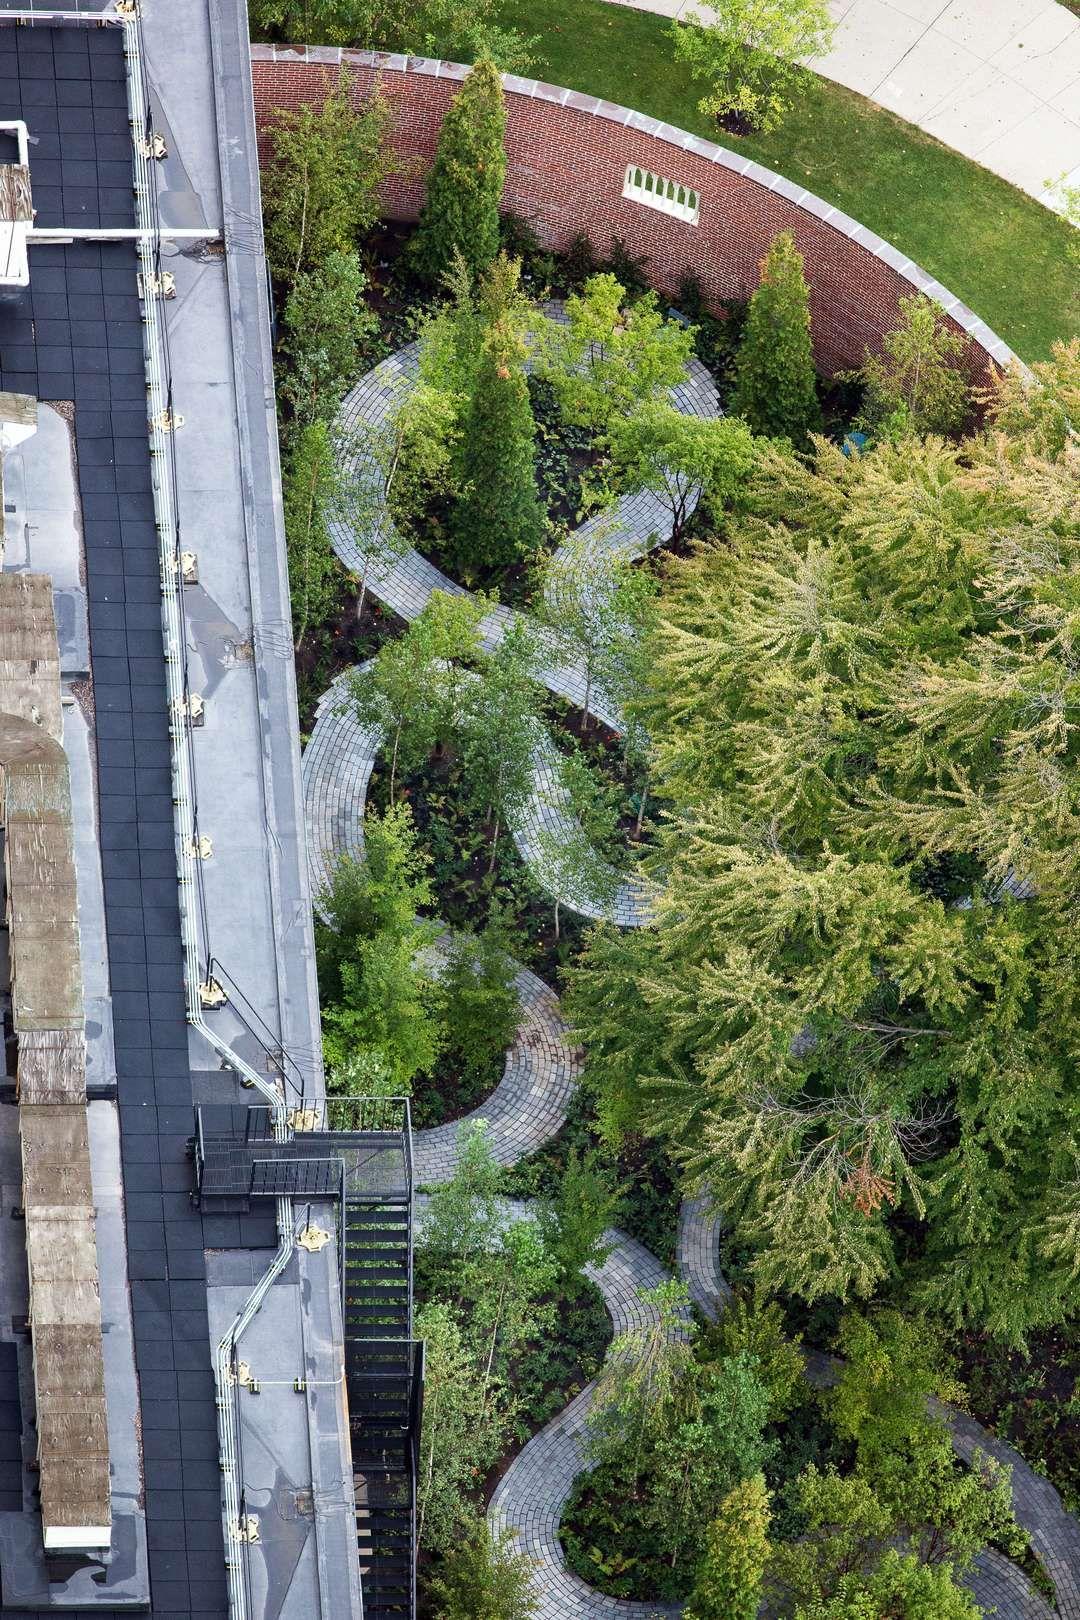 Boston's New Common: Inside The Isabella Stewart Gardner